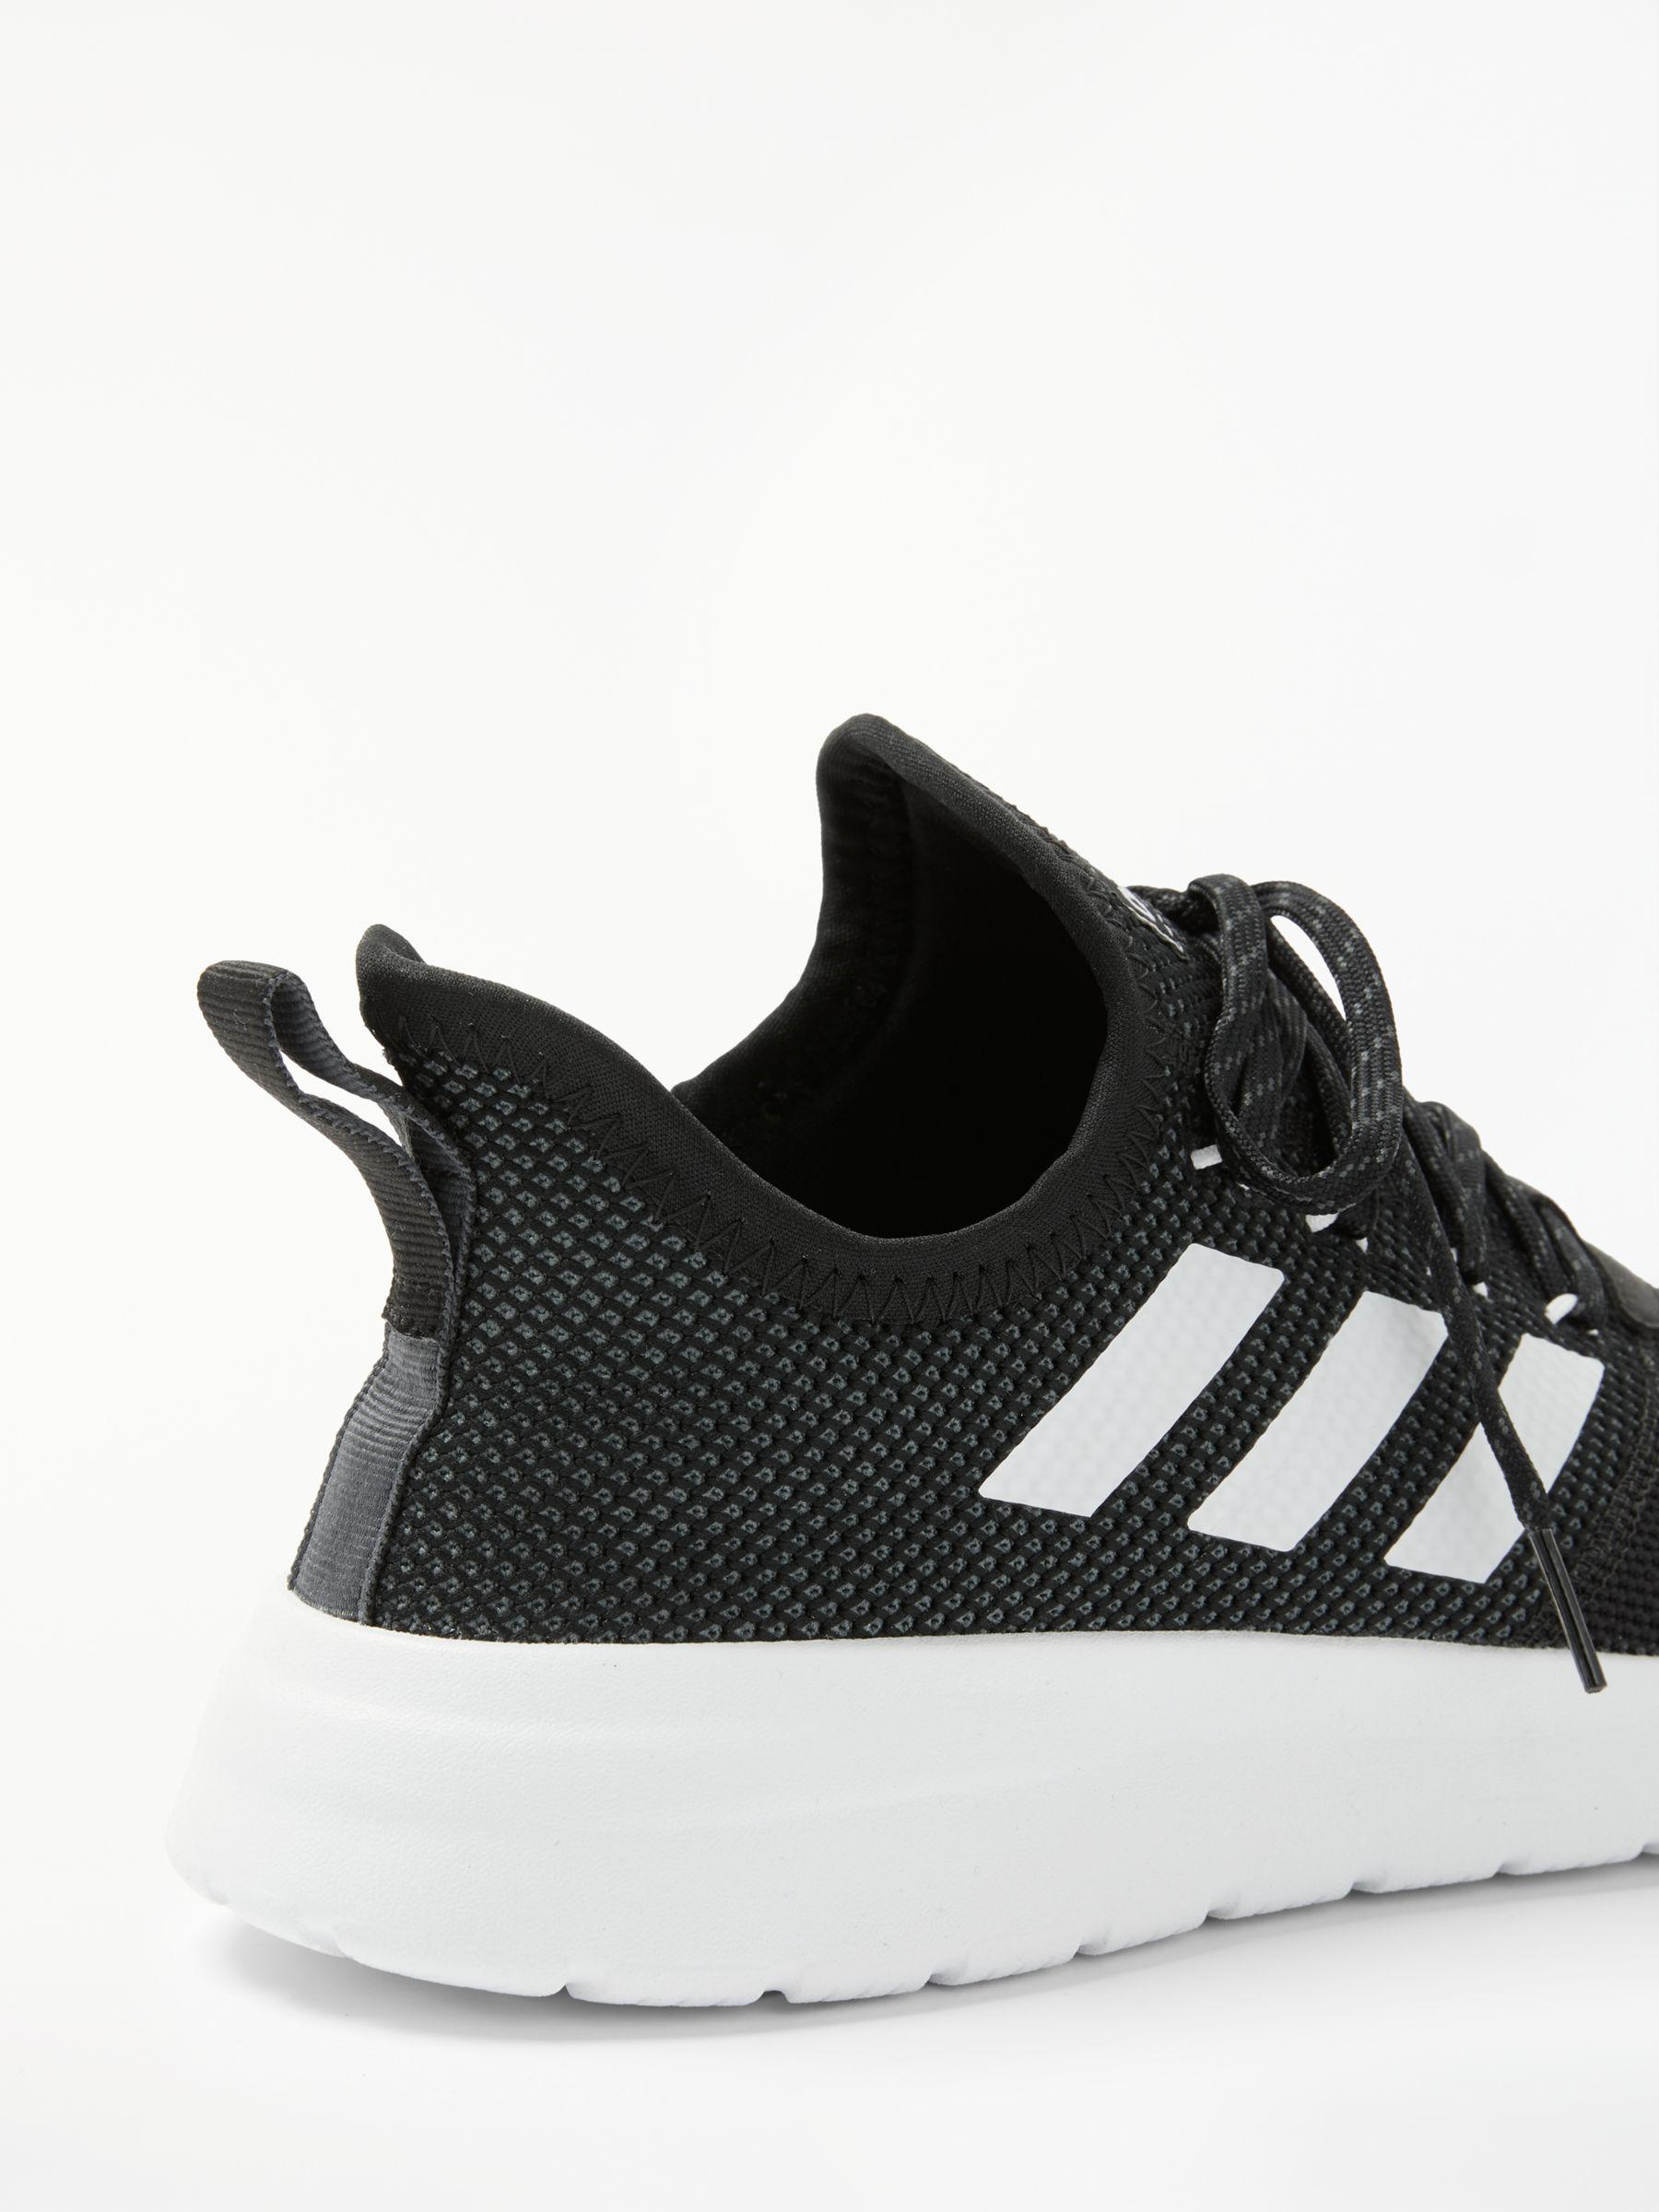 b05c1b81b5a adidas Lite Racer Reborn Men s Shoes in Black for Men - Lyst